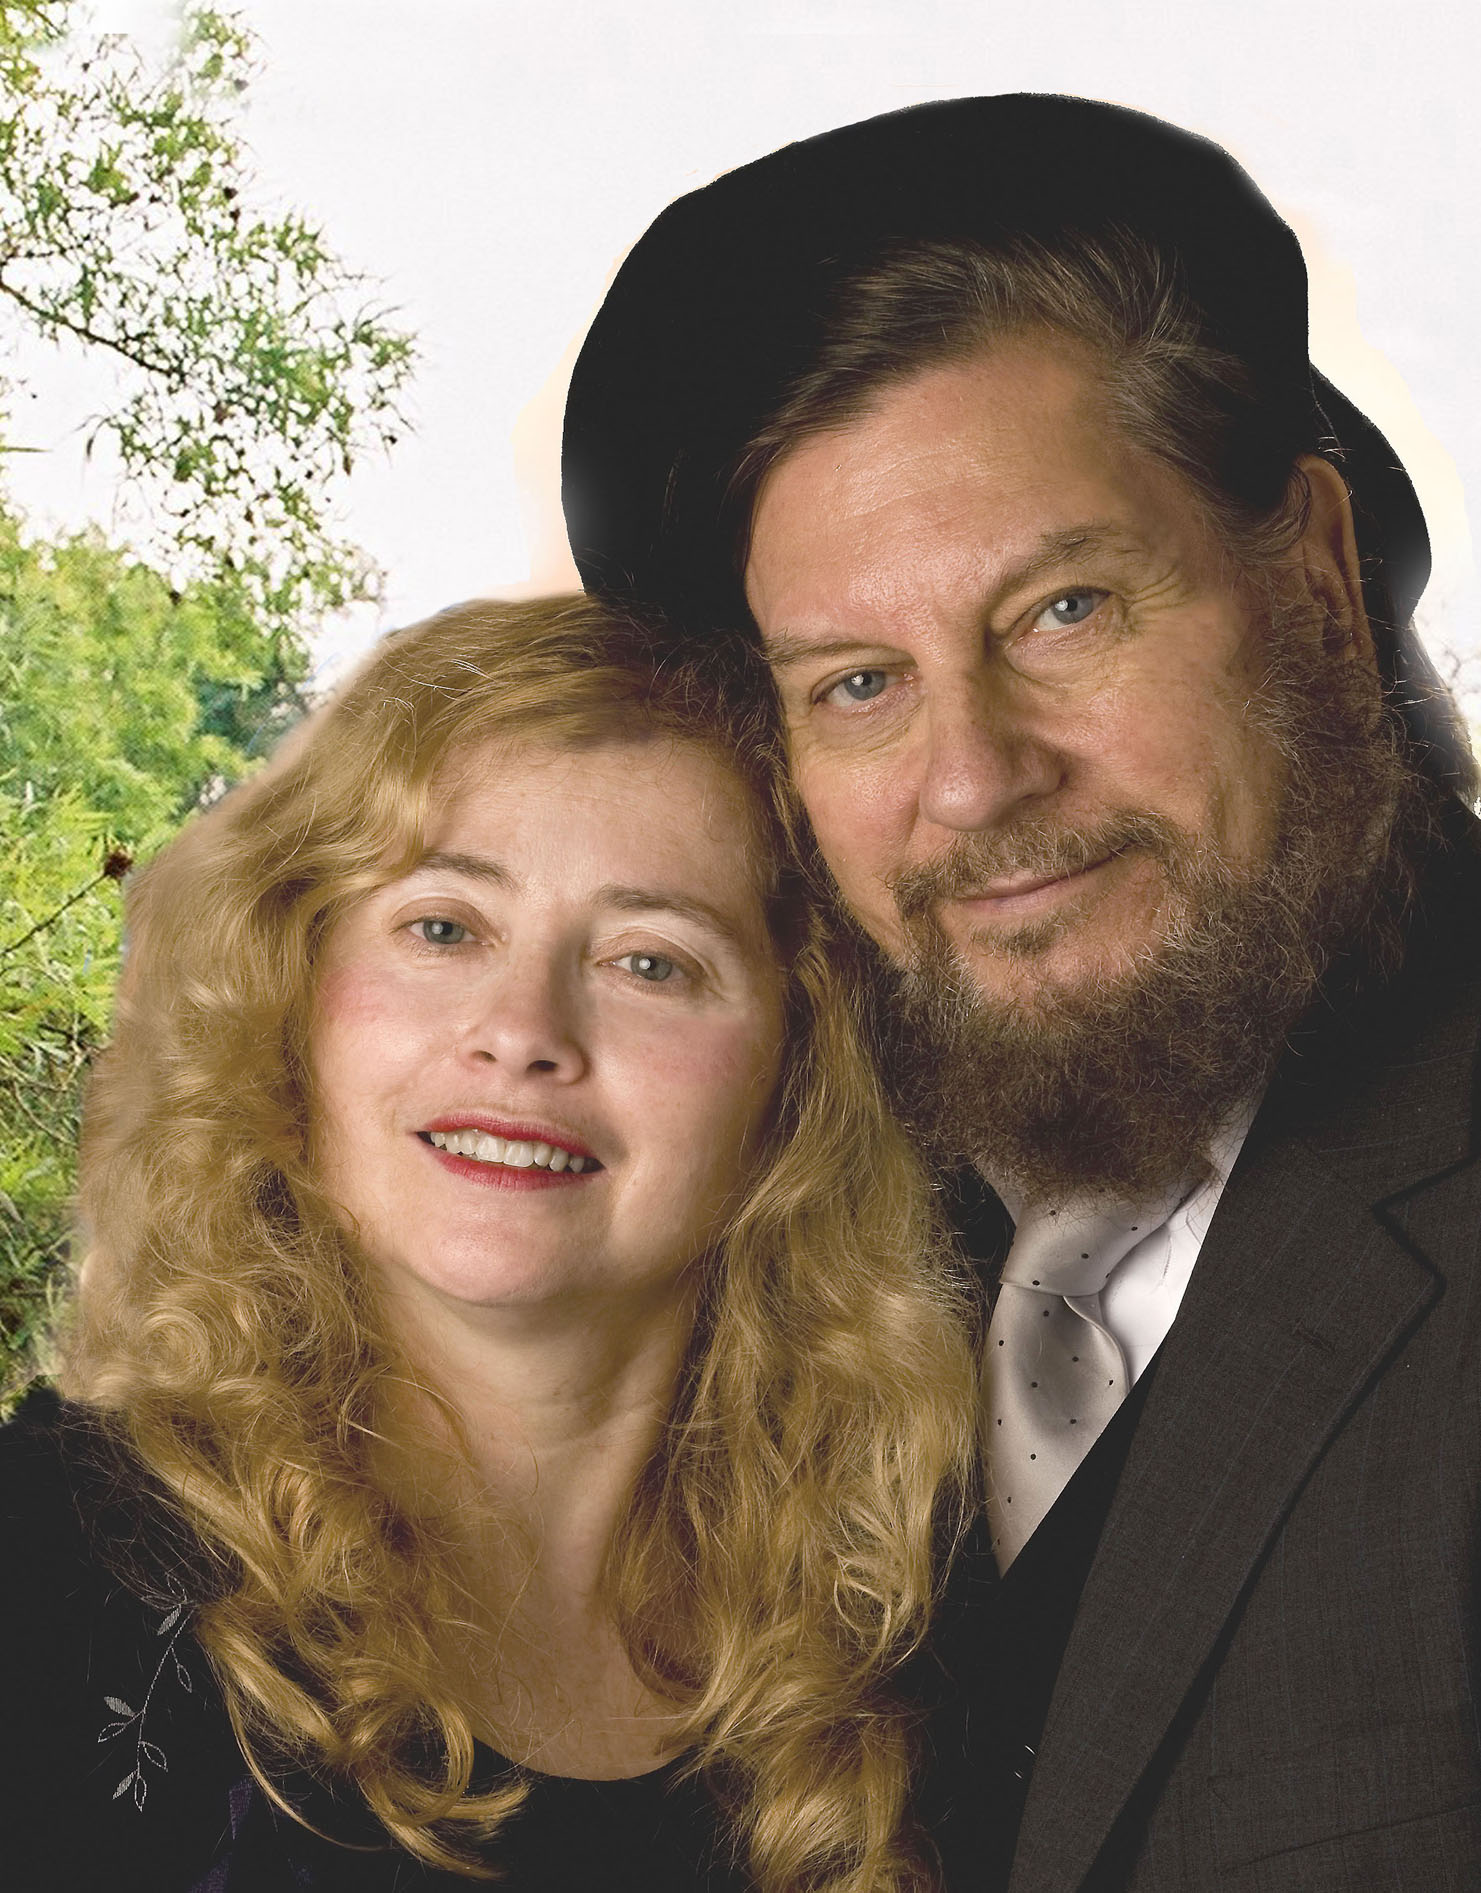 JJ & Desiree Hurtak + Alan Steinfield